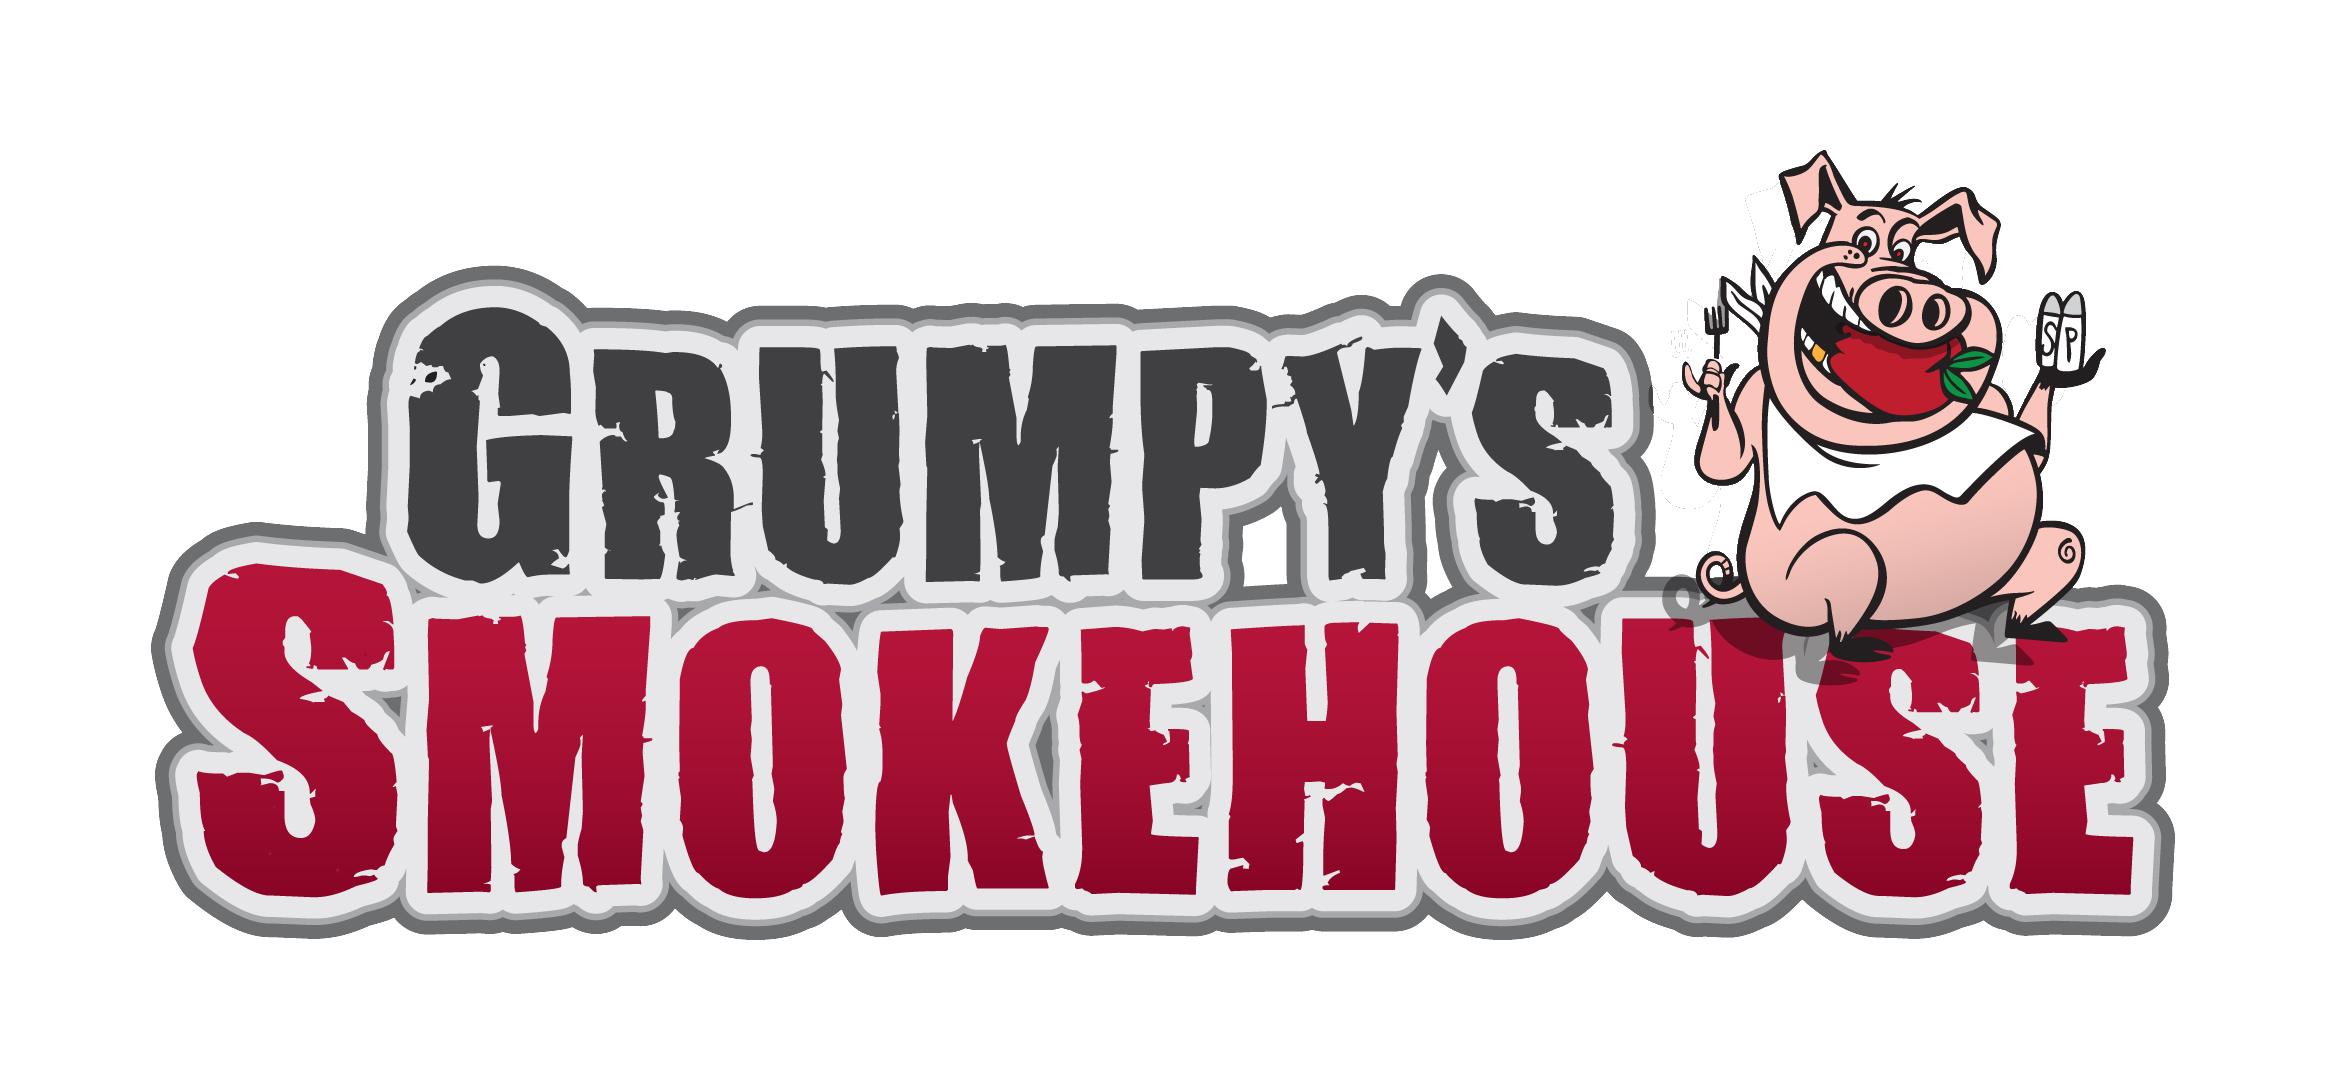 Crabs clipart grumpy. S smokehouse barbecue the